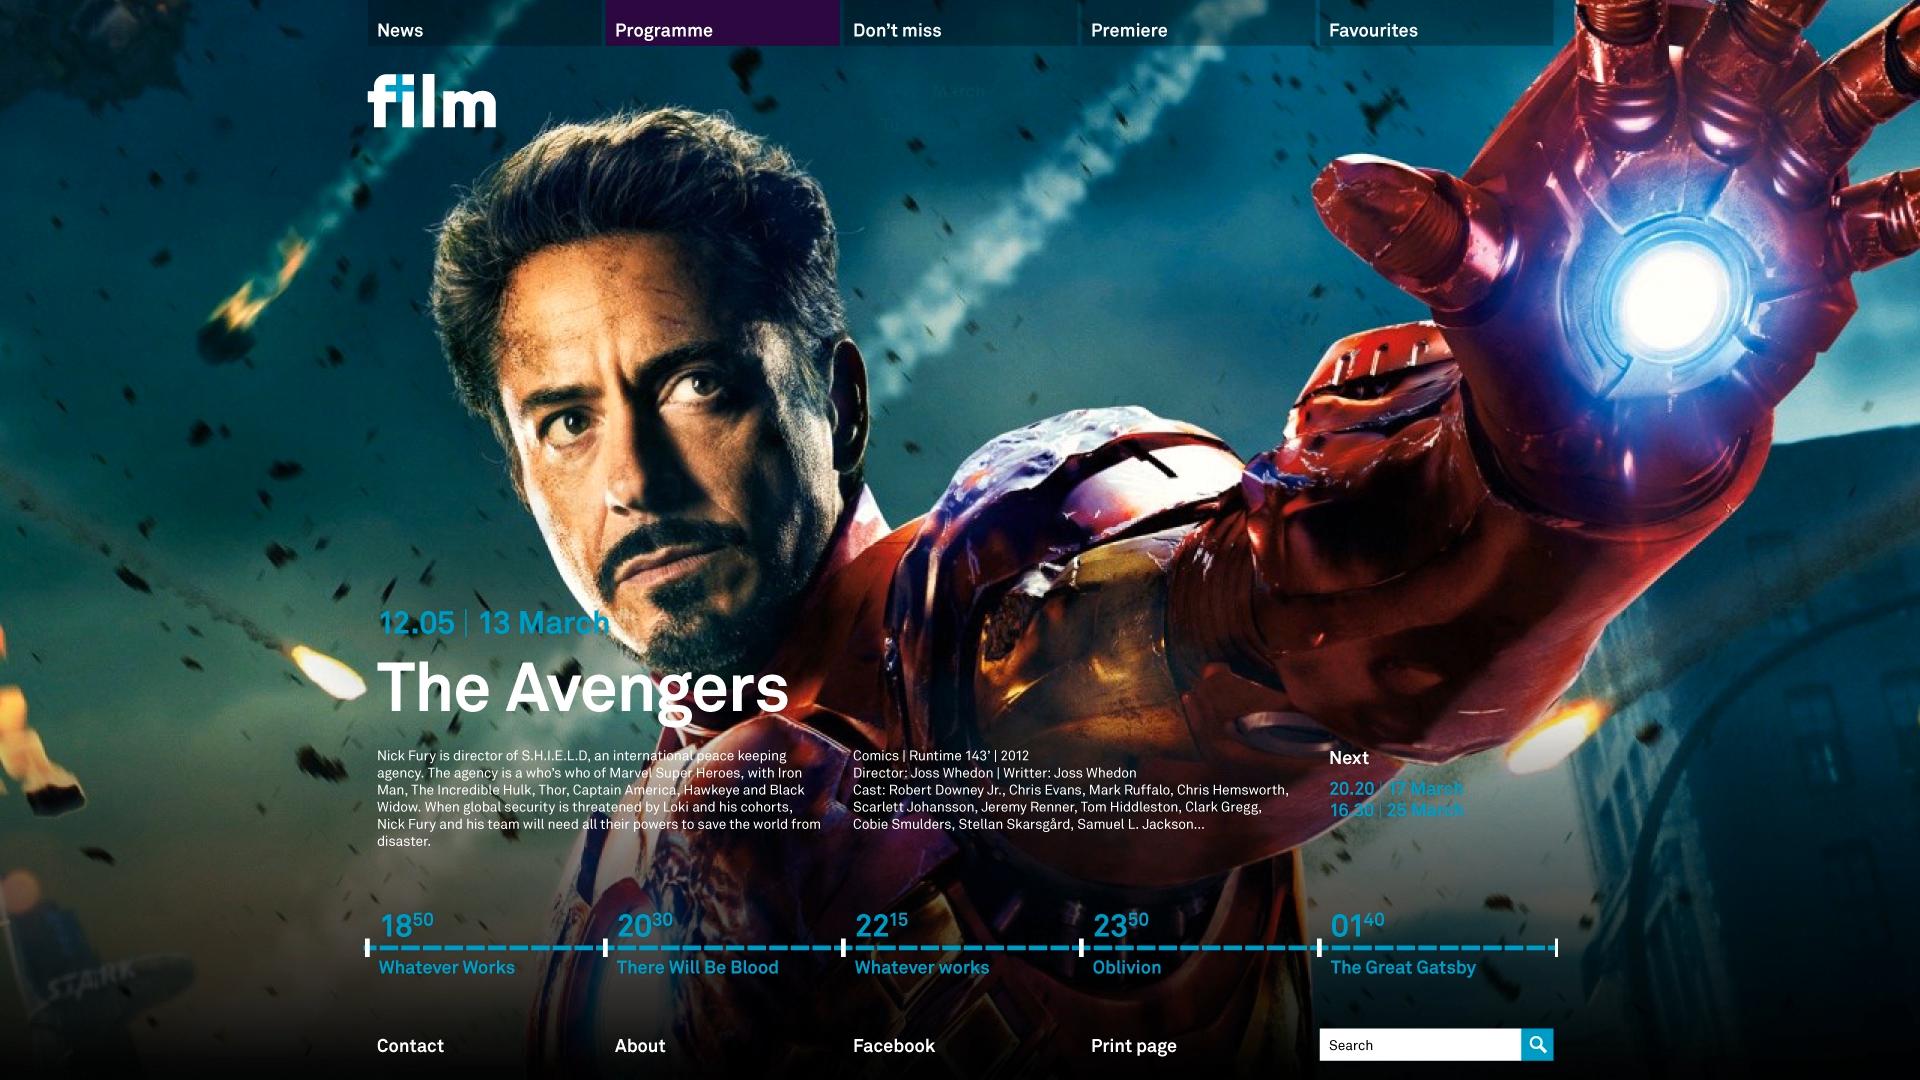 web page design ironman